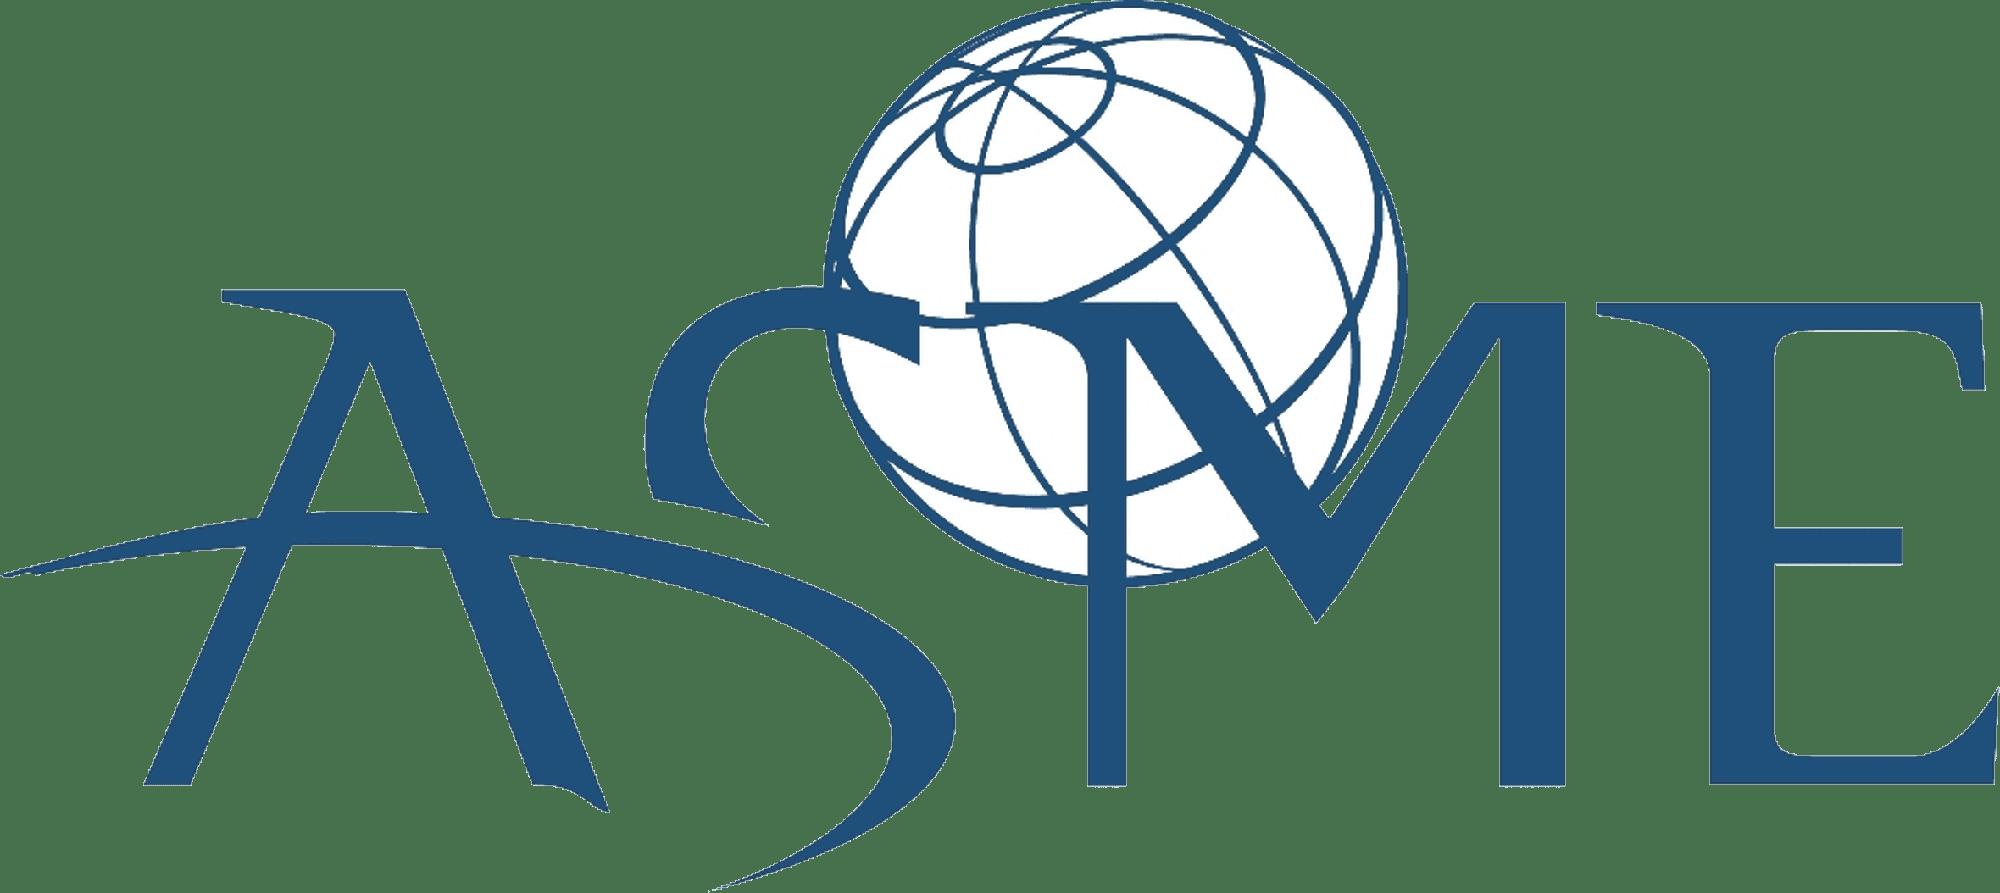 https://woytindustries.com/wp-content/uploads/2019/01/eca443b6-4595-4a11-adf9-57f0c1136194ASME_Logo.png